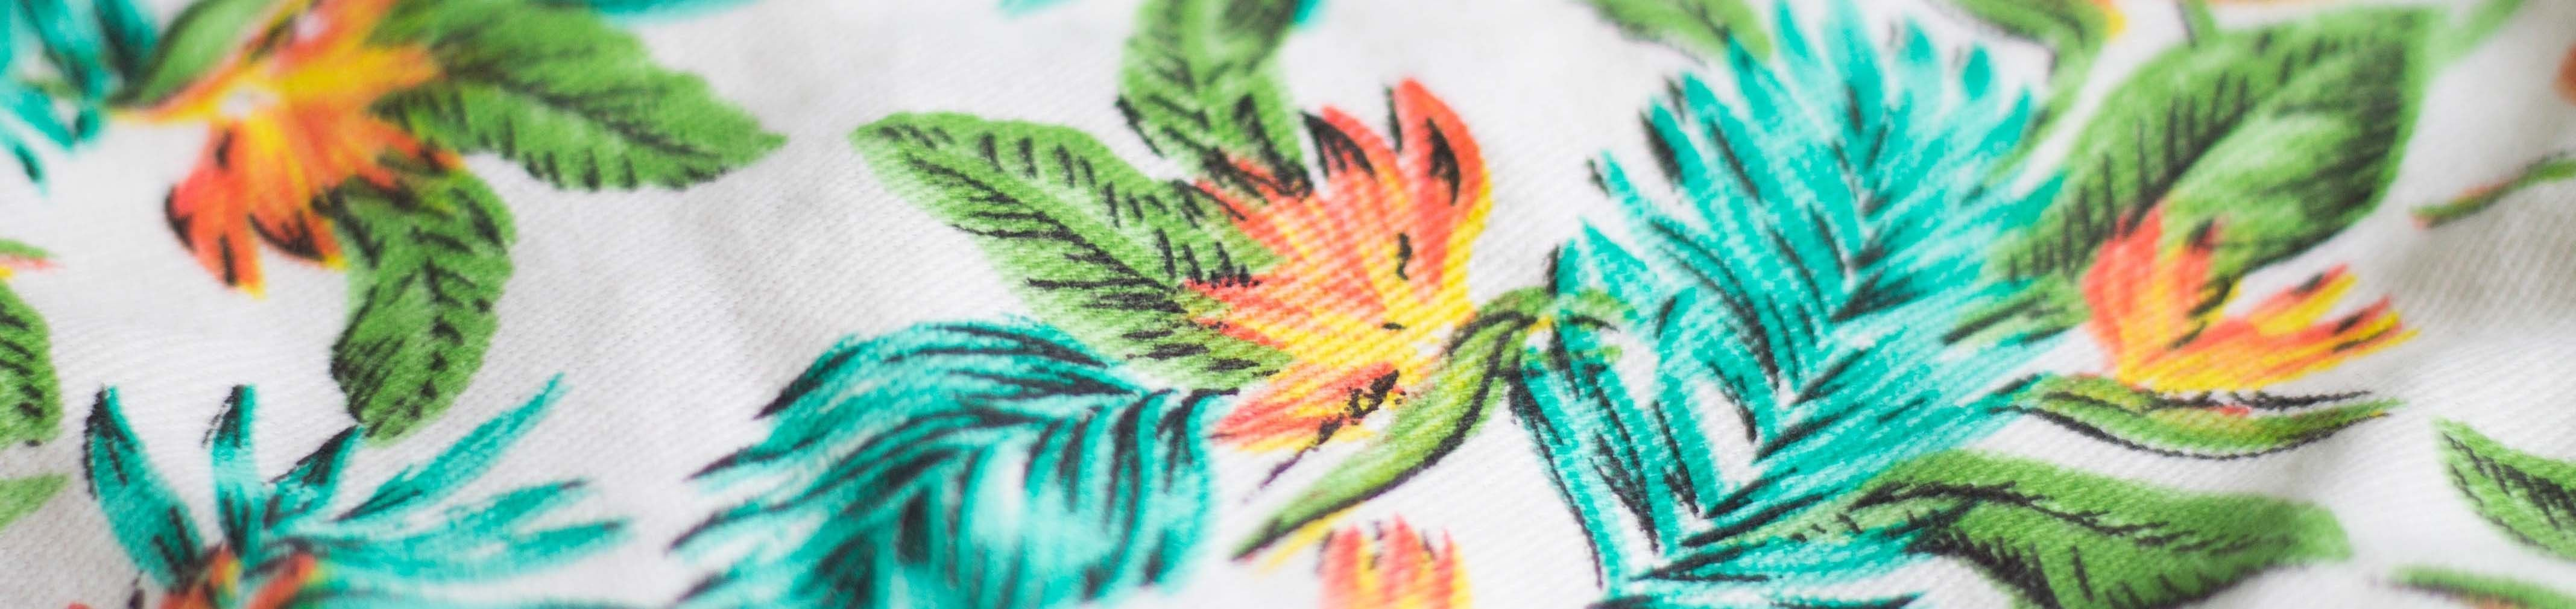 Culori textile